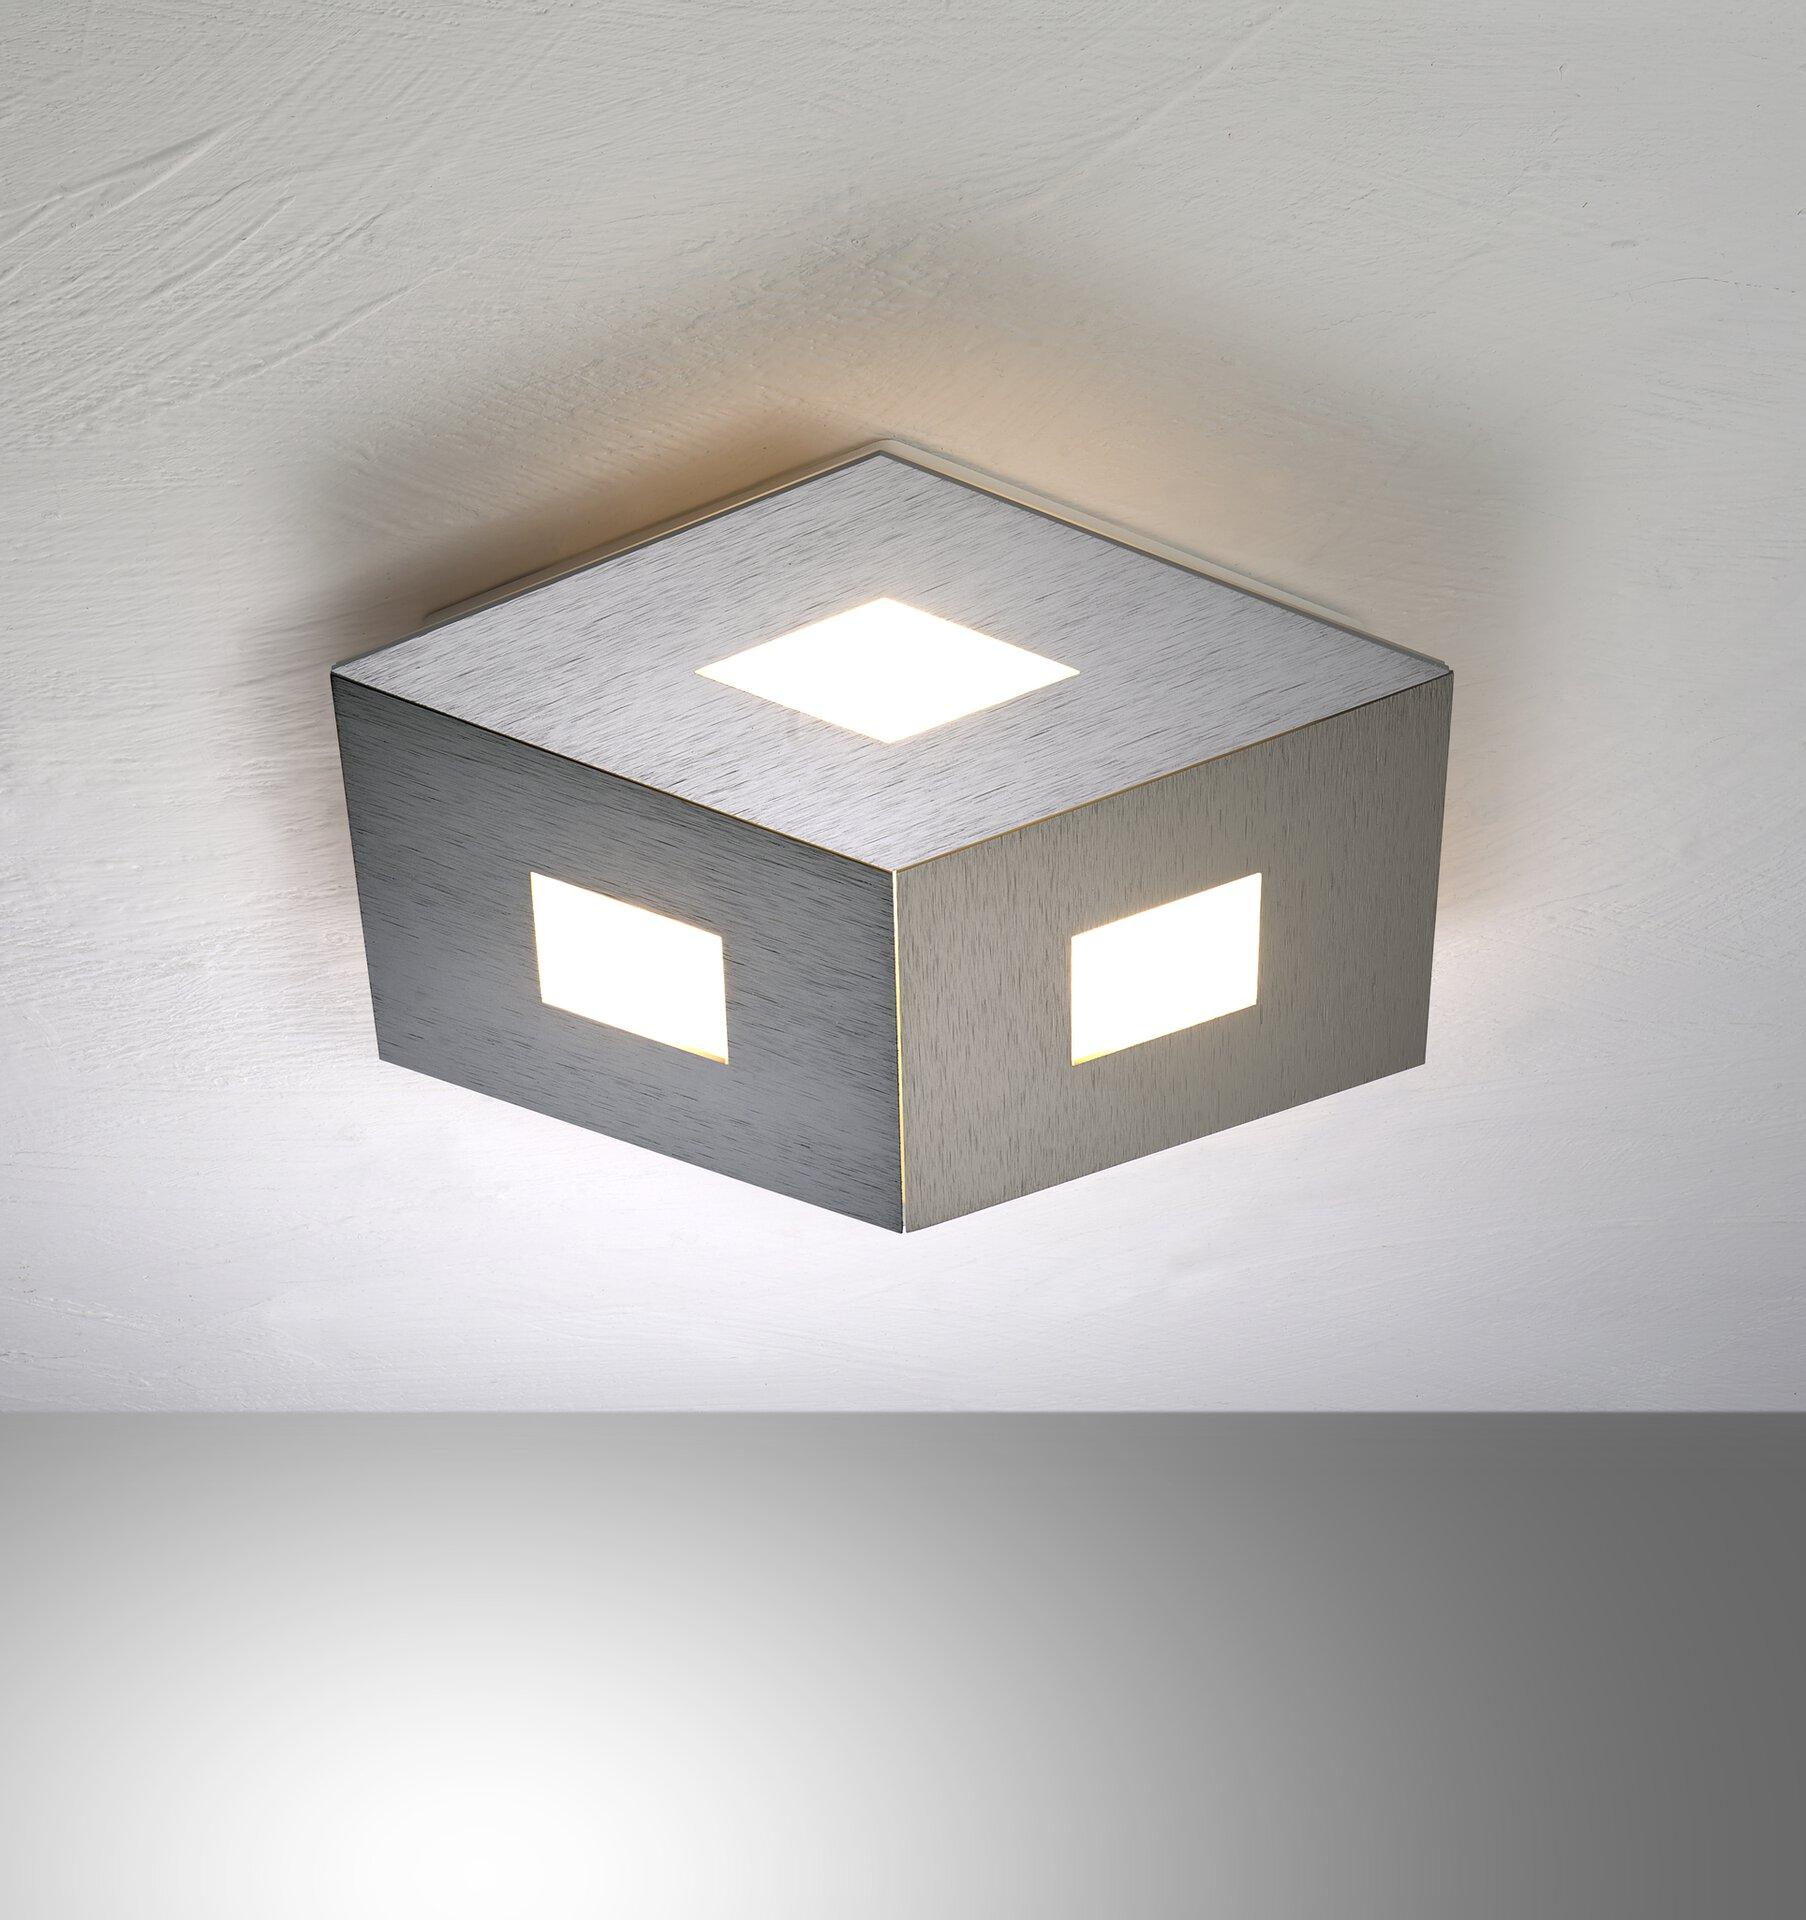 Deckenleuchte BOX COMFORT Bopp Metall mehrfarbig 35 x 4 x 35 cm